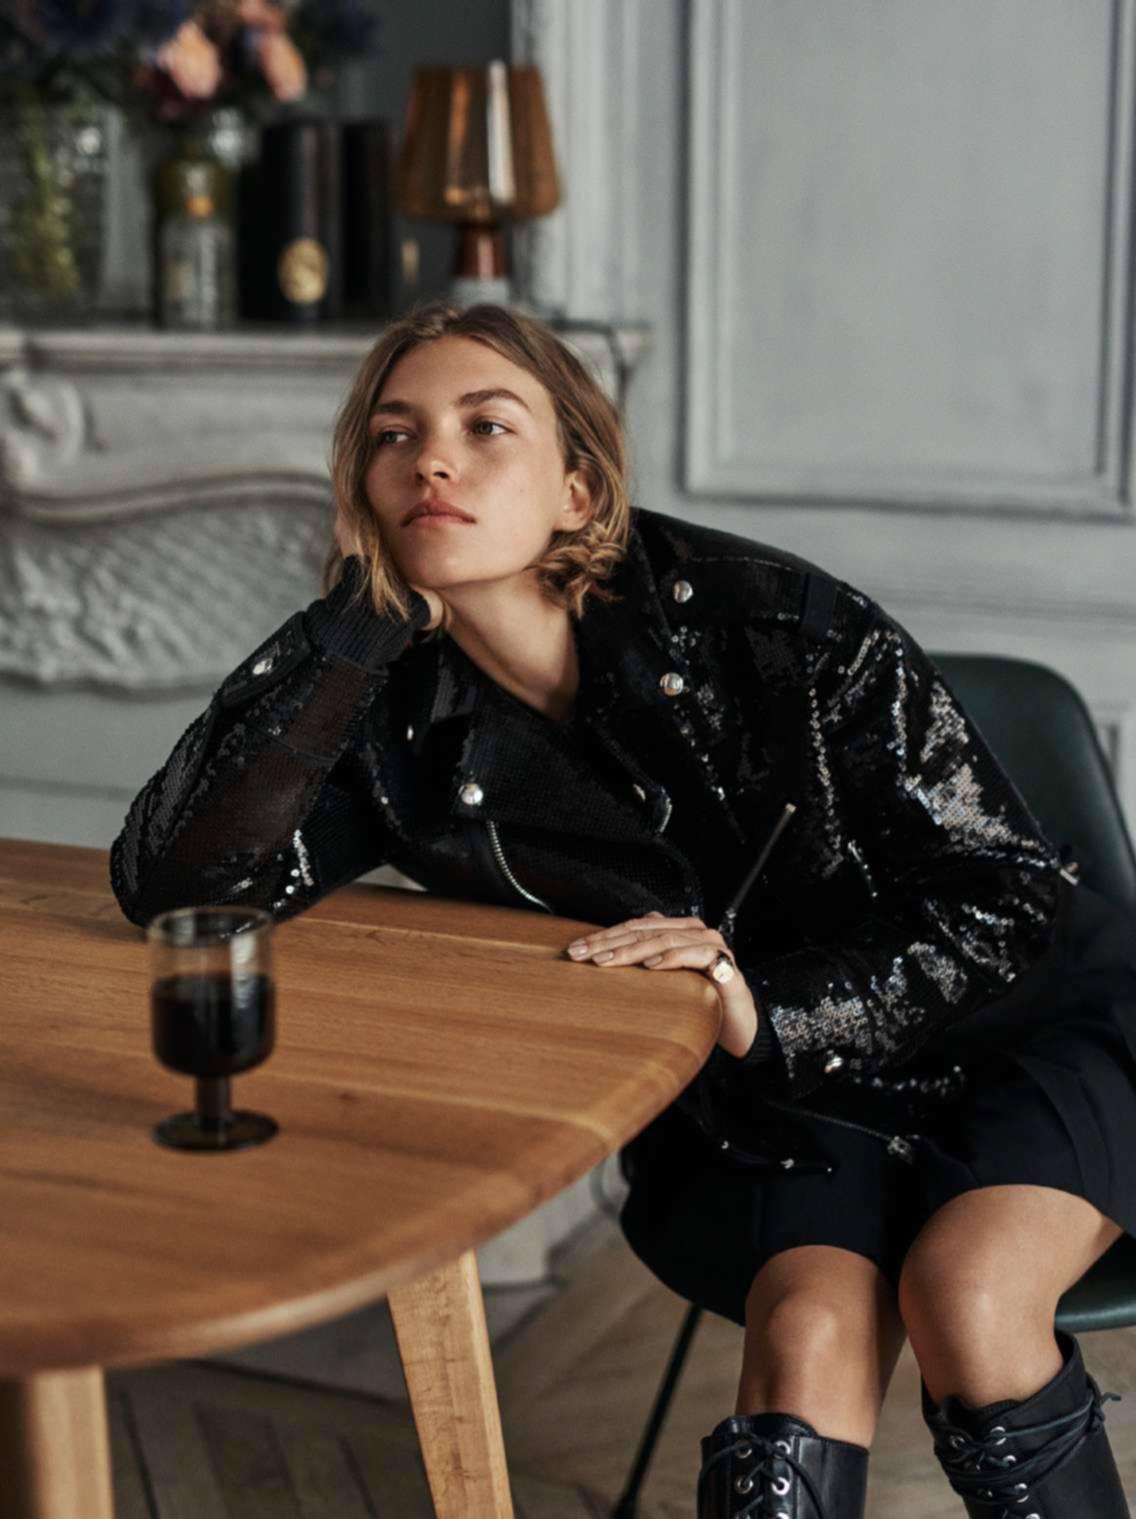 куртка оверсайз, свитер из хлопка, юбка, сапоги, Diesel Black Gold; кольцо-печатка из золота и серебра, Louis Vuitton